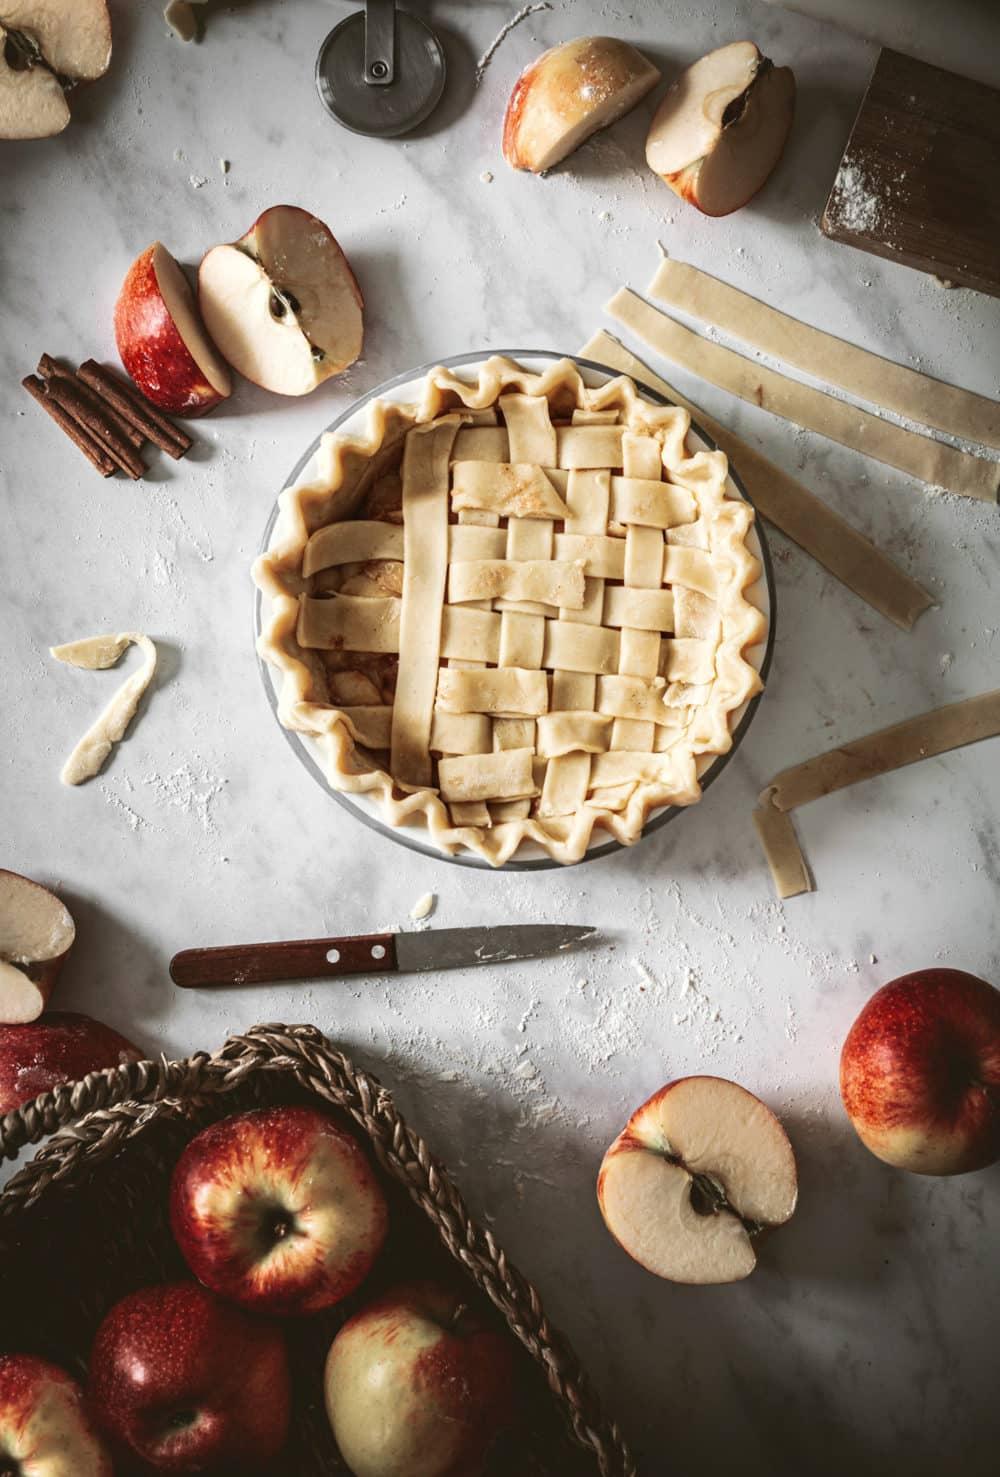 Lattice pie style decorating